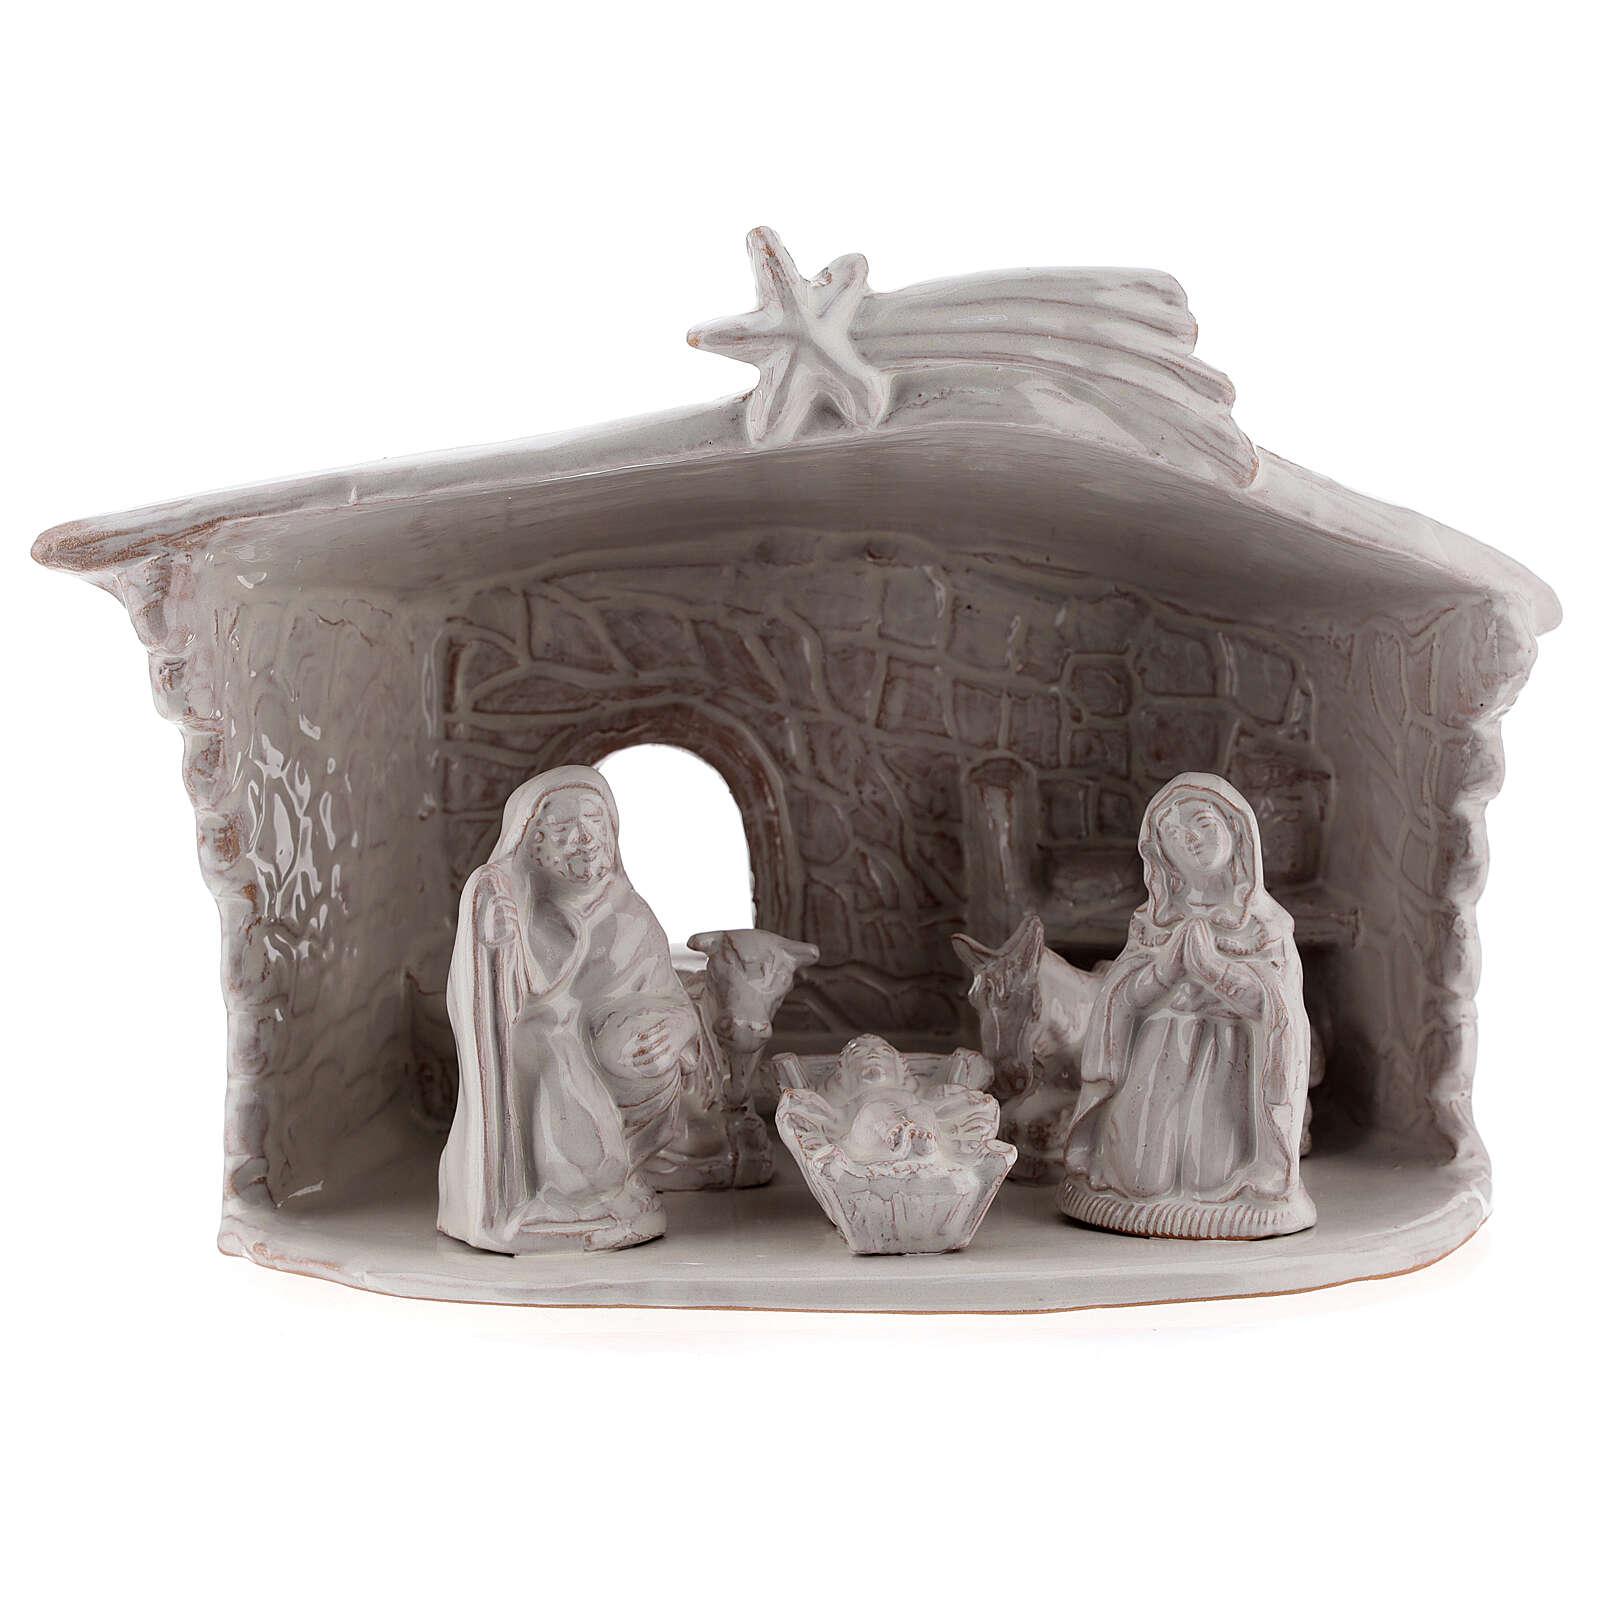 Nativity stable with stone walls white Deruta terracotta 20 cm 4